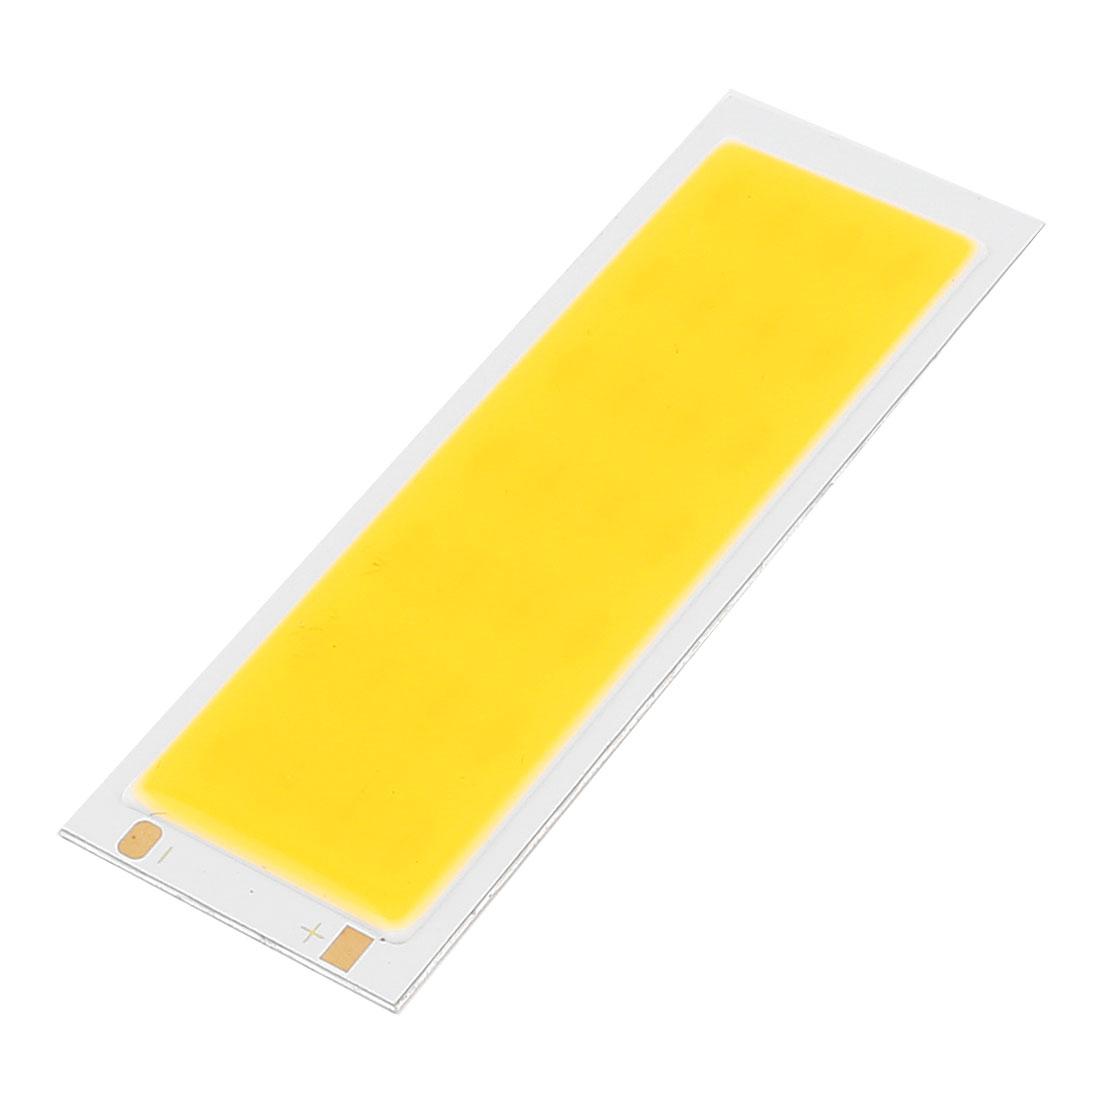 7W DC12-14V 600mA 80-90LM/W Warm White LED Light COB Lamp Beads Chip